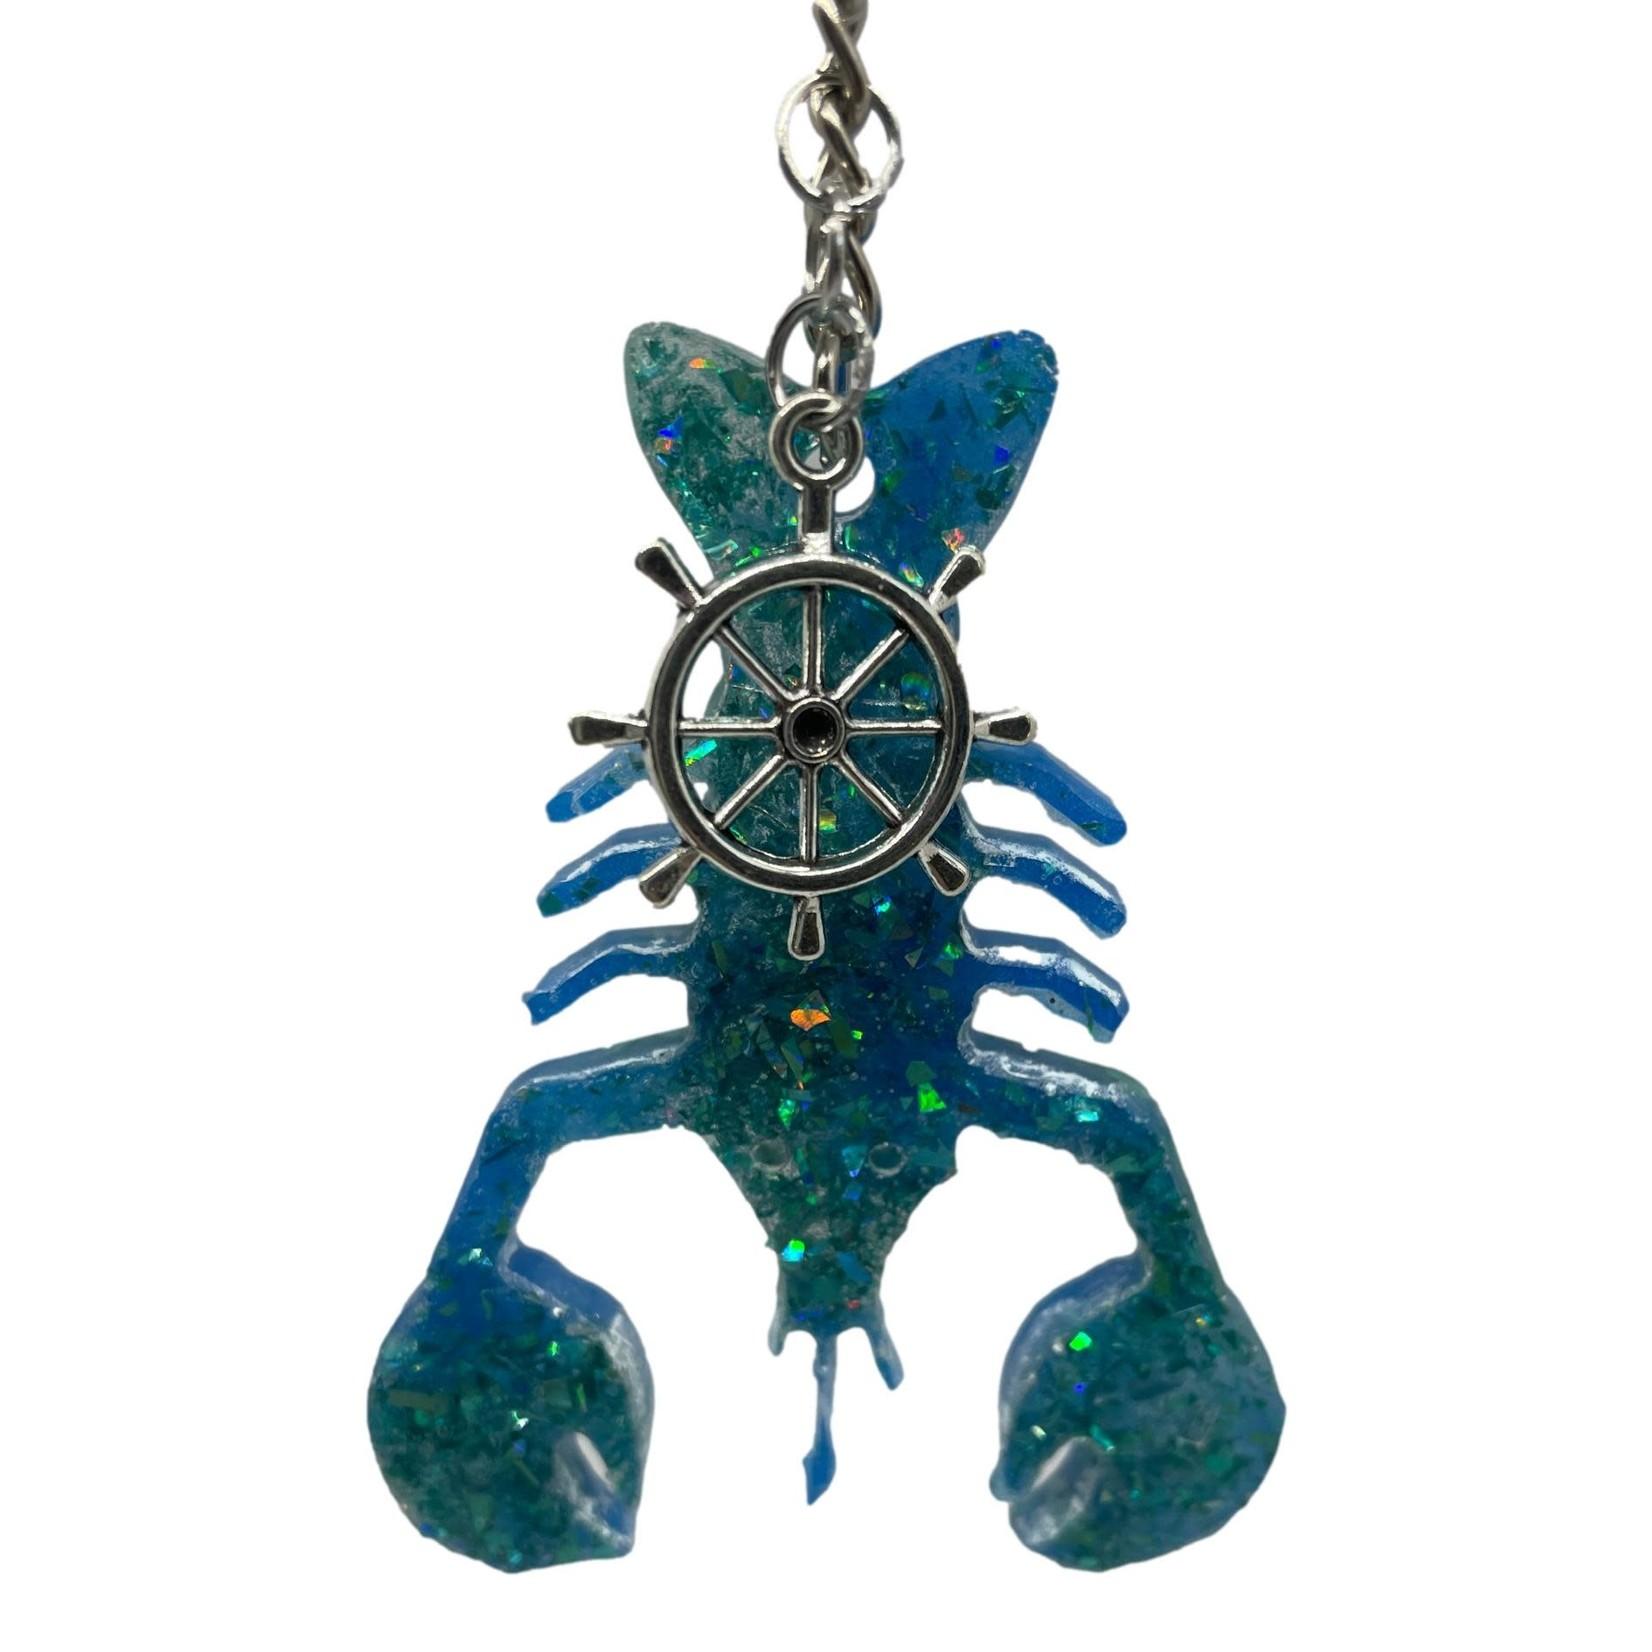 East Coast Sirens Blue & Teal Lobster Key Chain